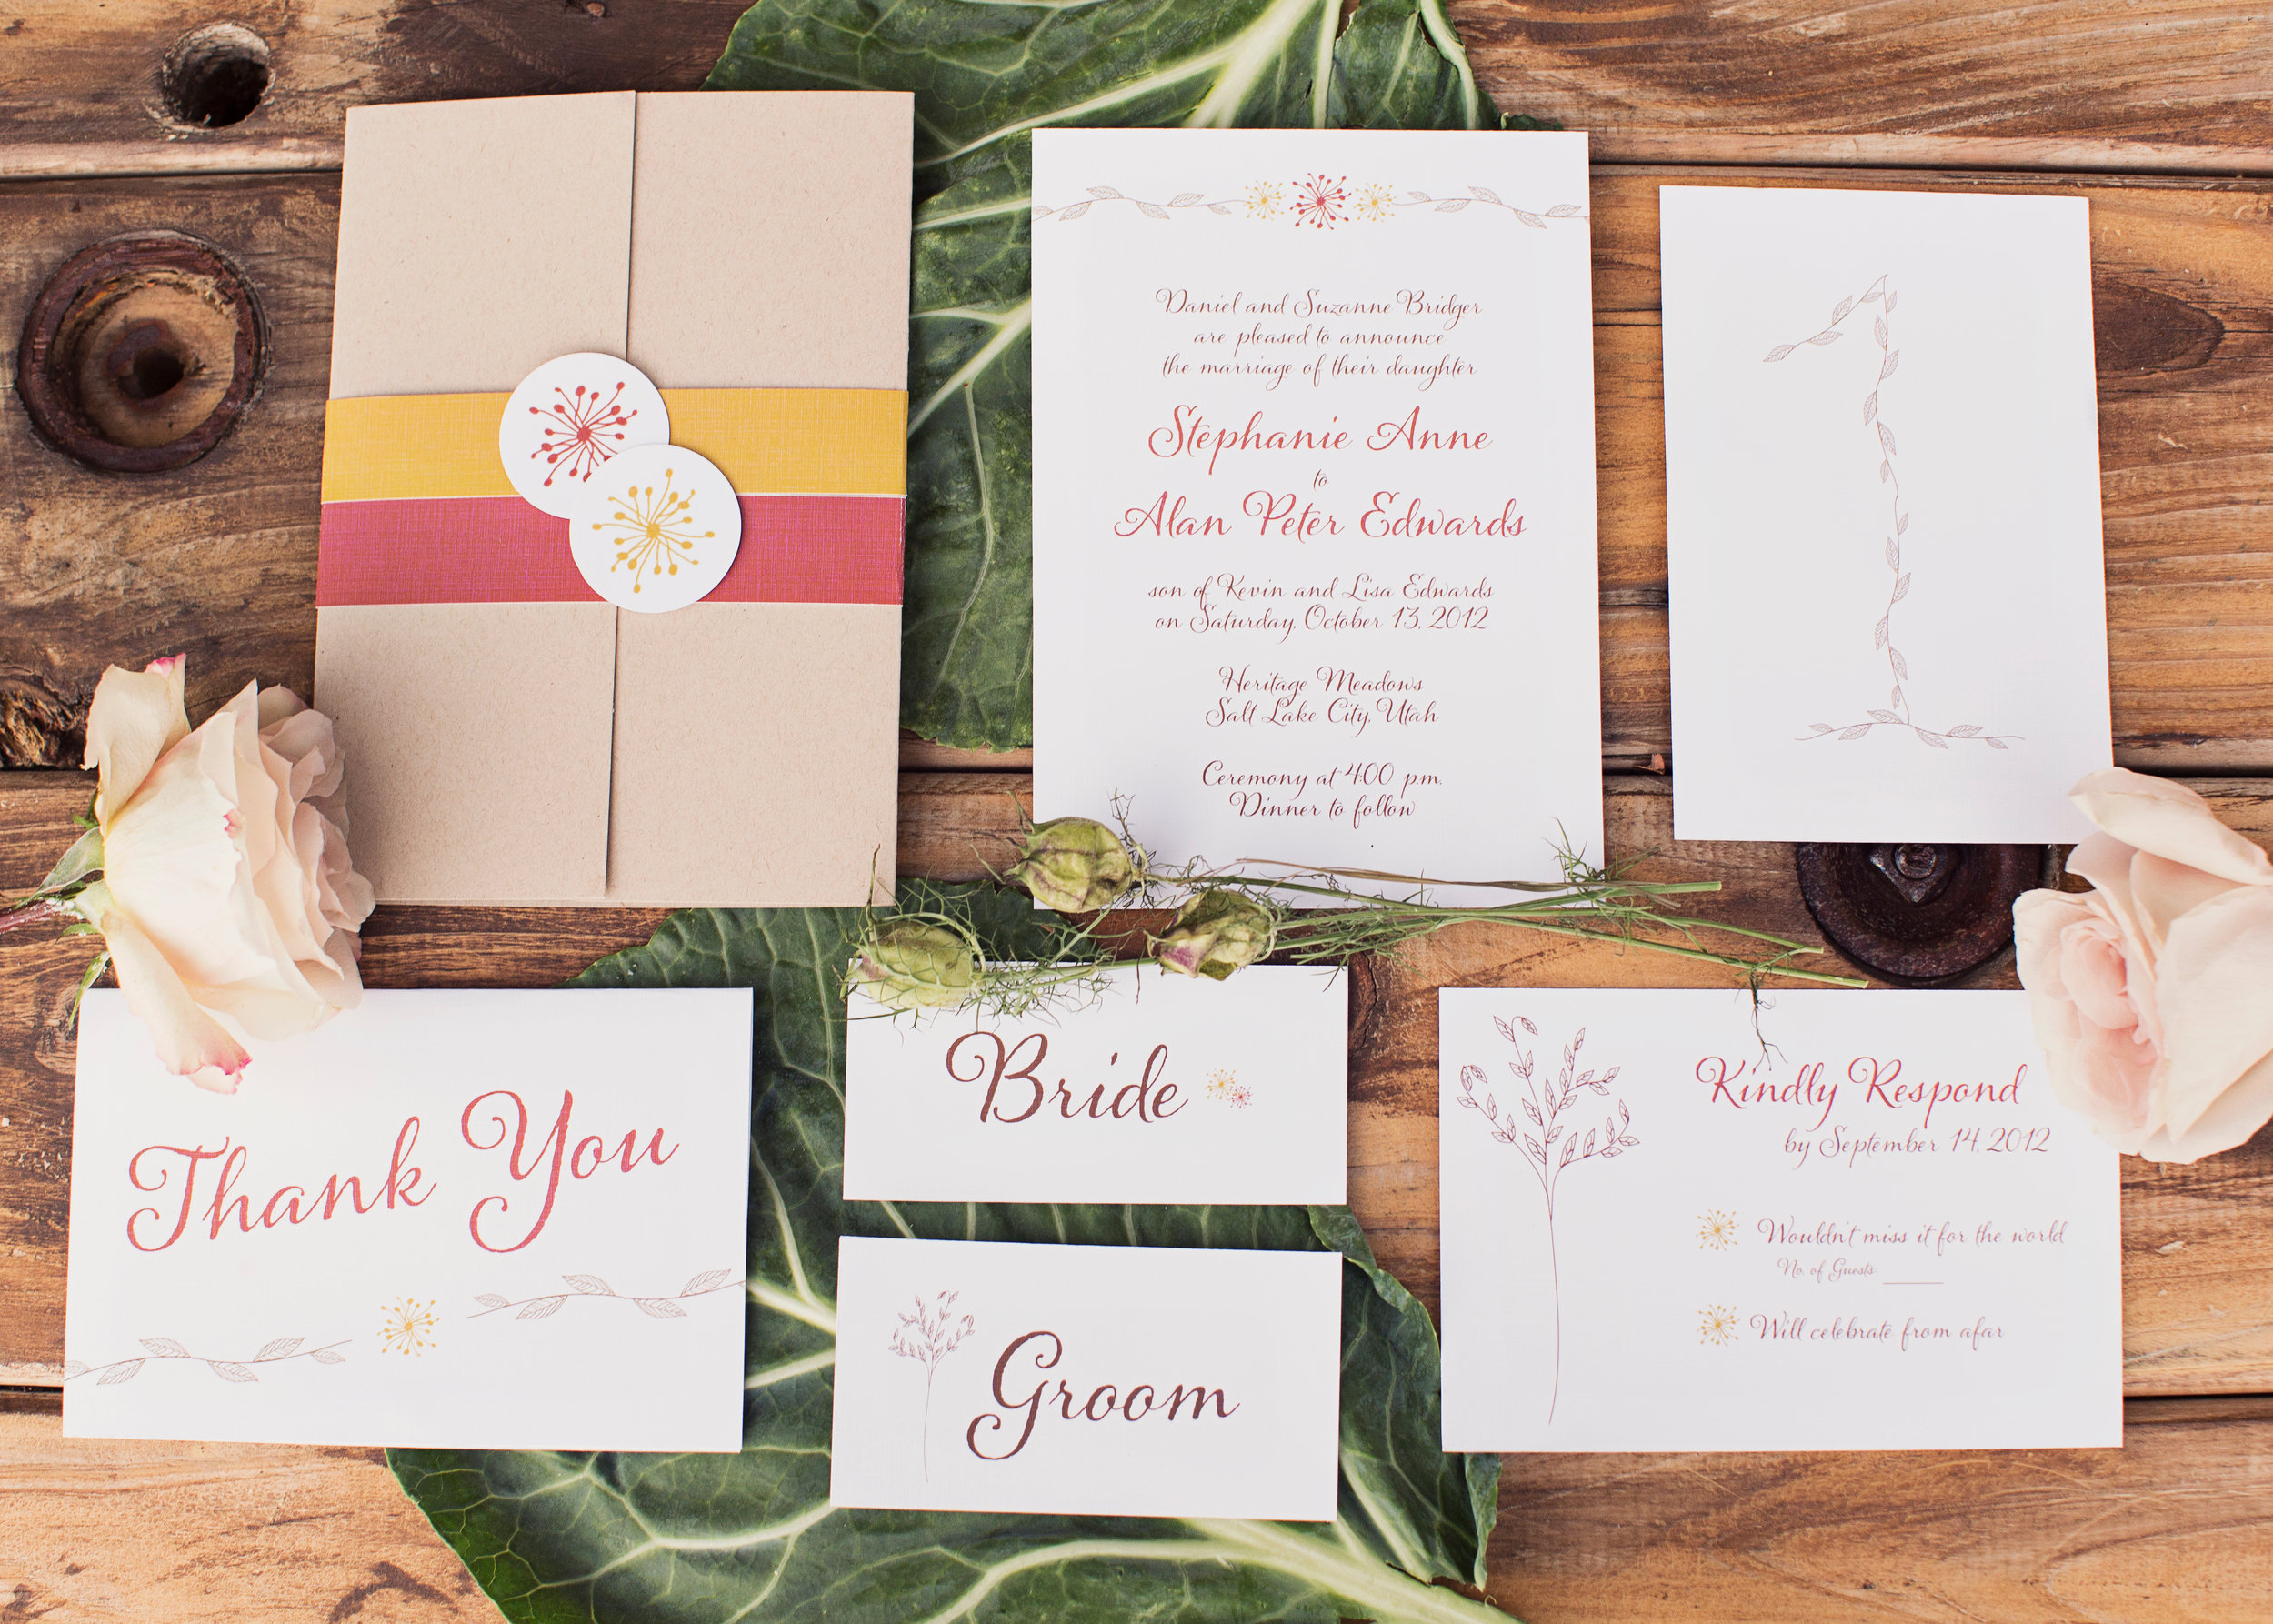 Bohemian Autumn Wedding Inspiration | Fall Wedding Inspiration | Bohemian Wedding Inspiration | Michelle Leo Events | Utah Event Planner and Designer | Alixann Loosle Photography